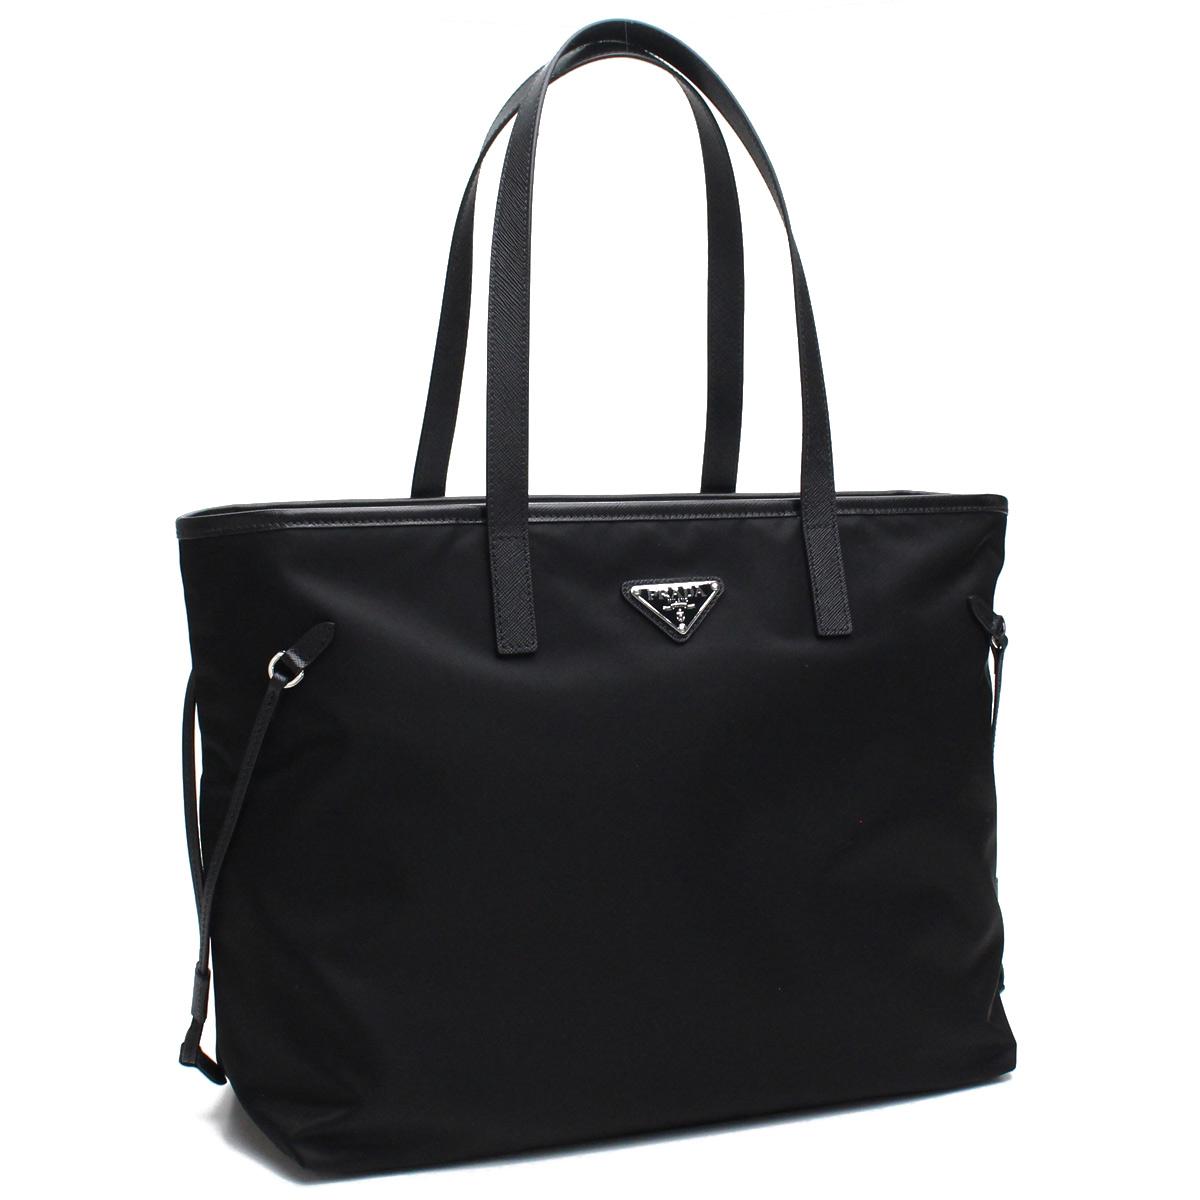 384e03acf0 Prada PRADA bag nylon tote bag 1BG401 V44 V OOM F0002 NERO black